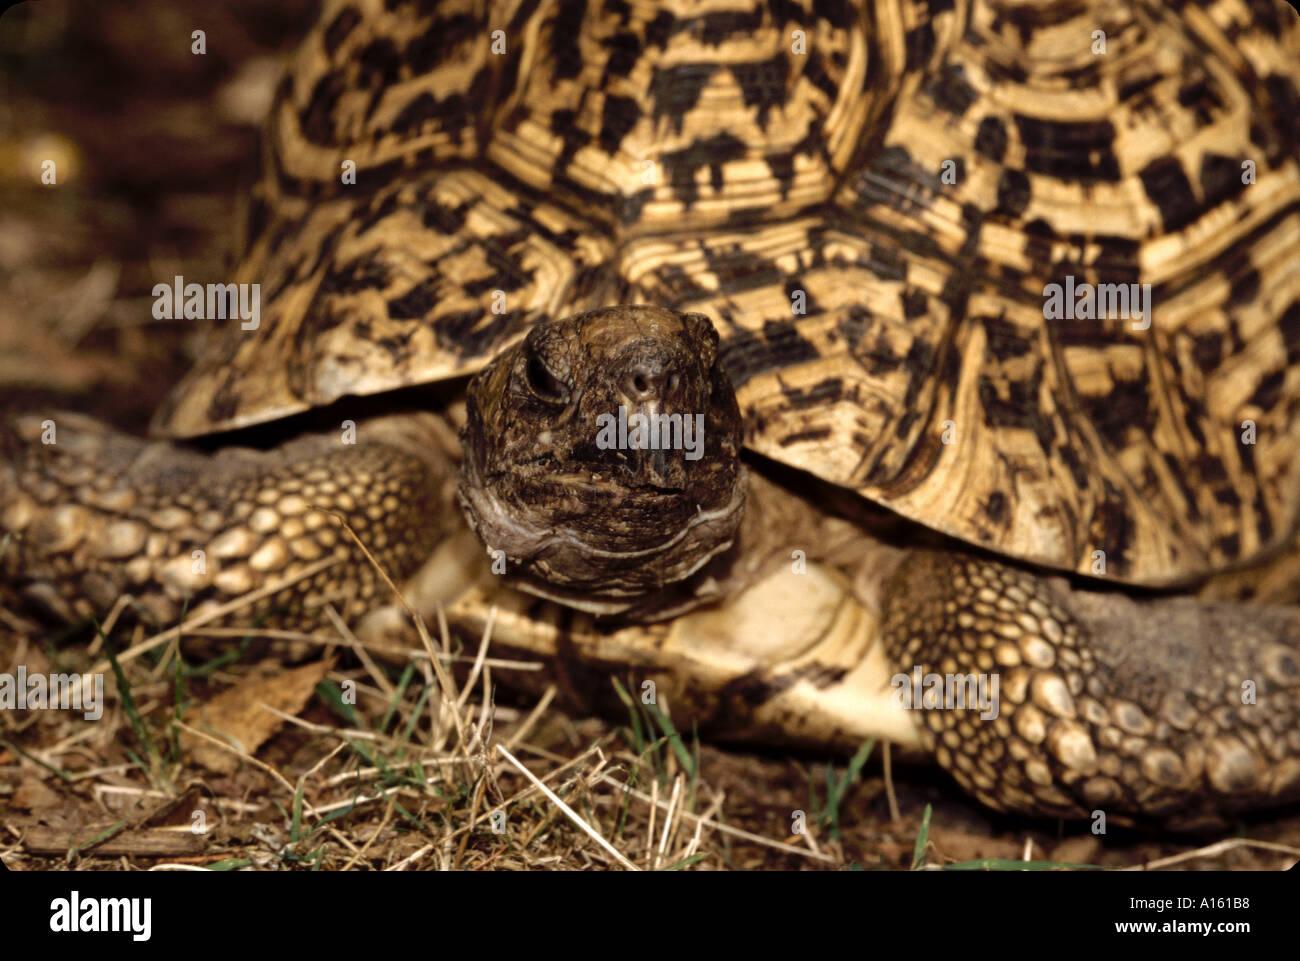 reptile tortoise leopard geochelone pardalis babcocki - Stock Image